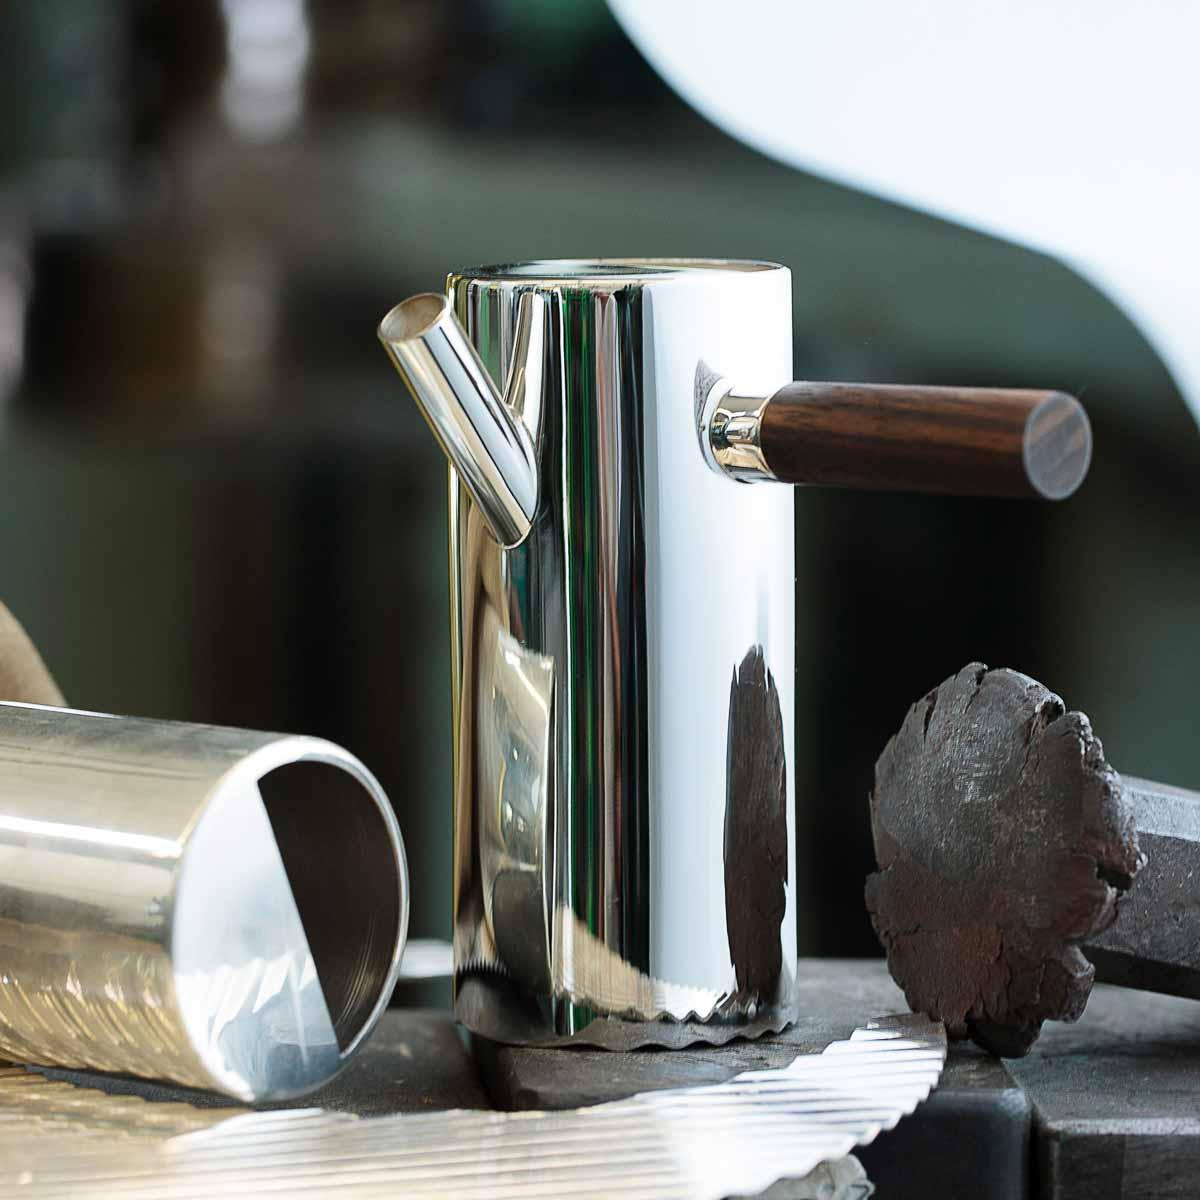 Wiener Silber Manufactur Wien